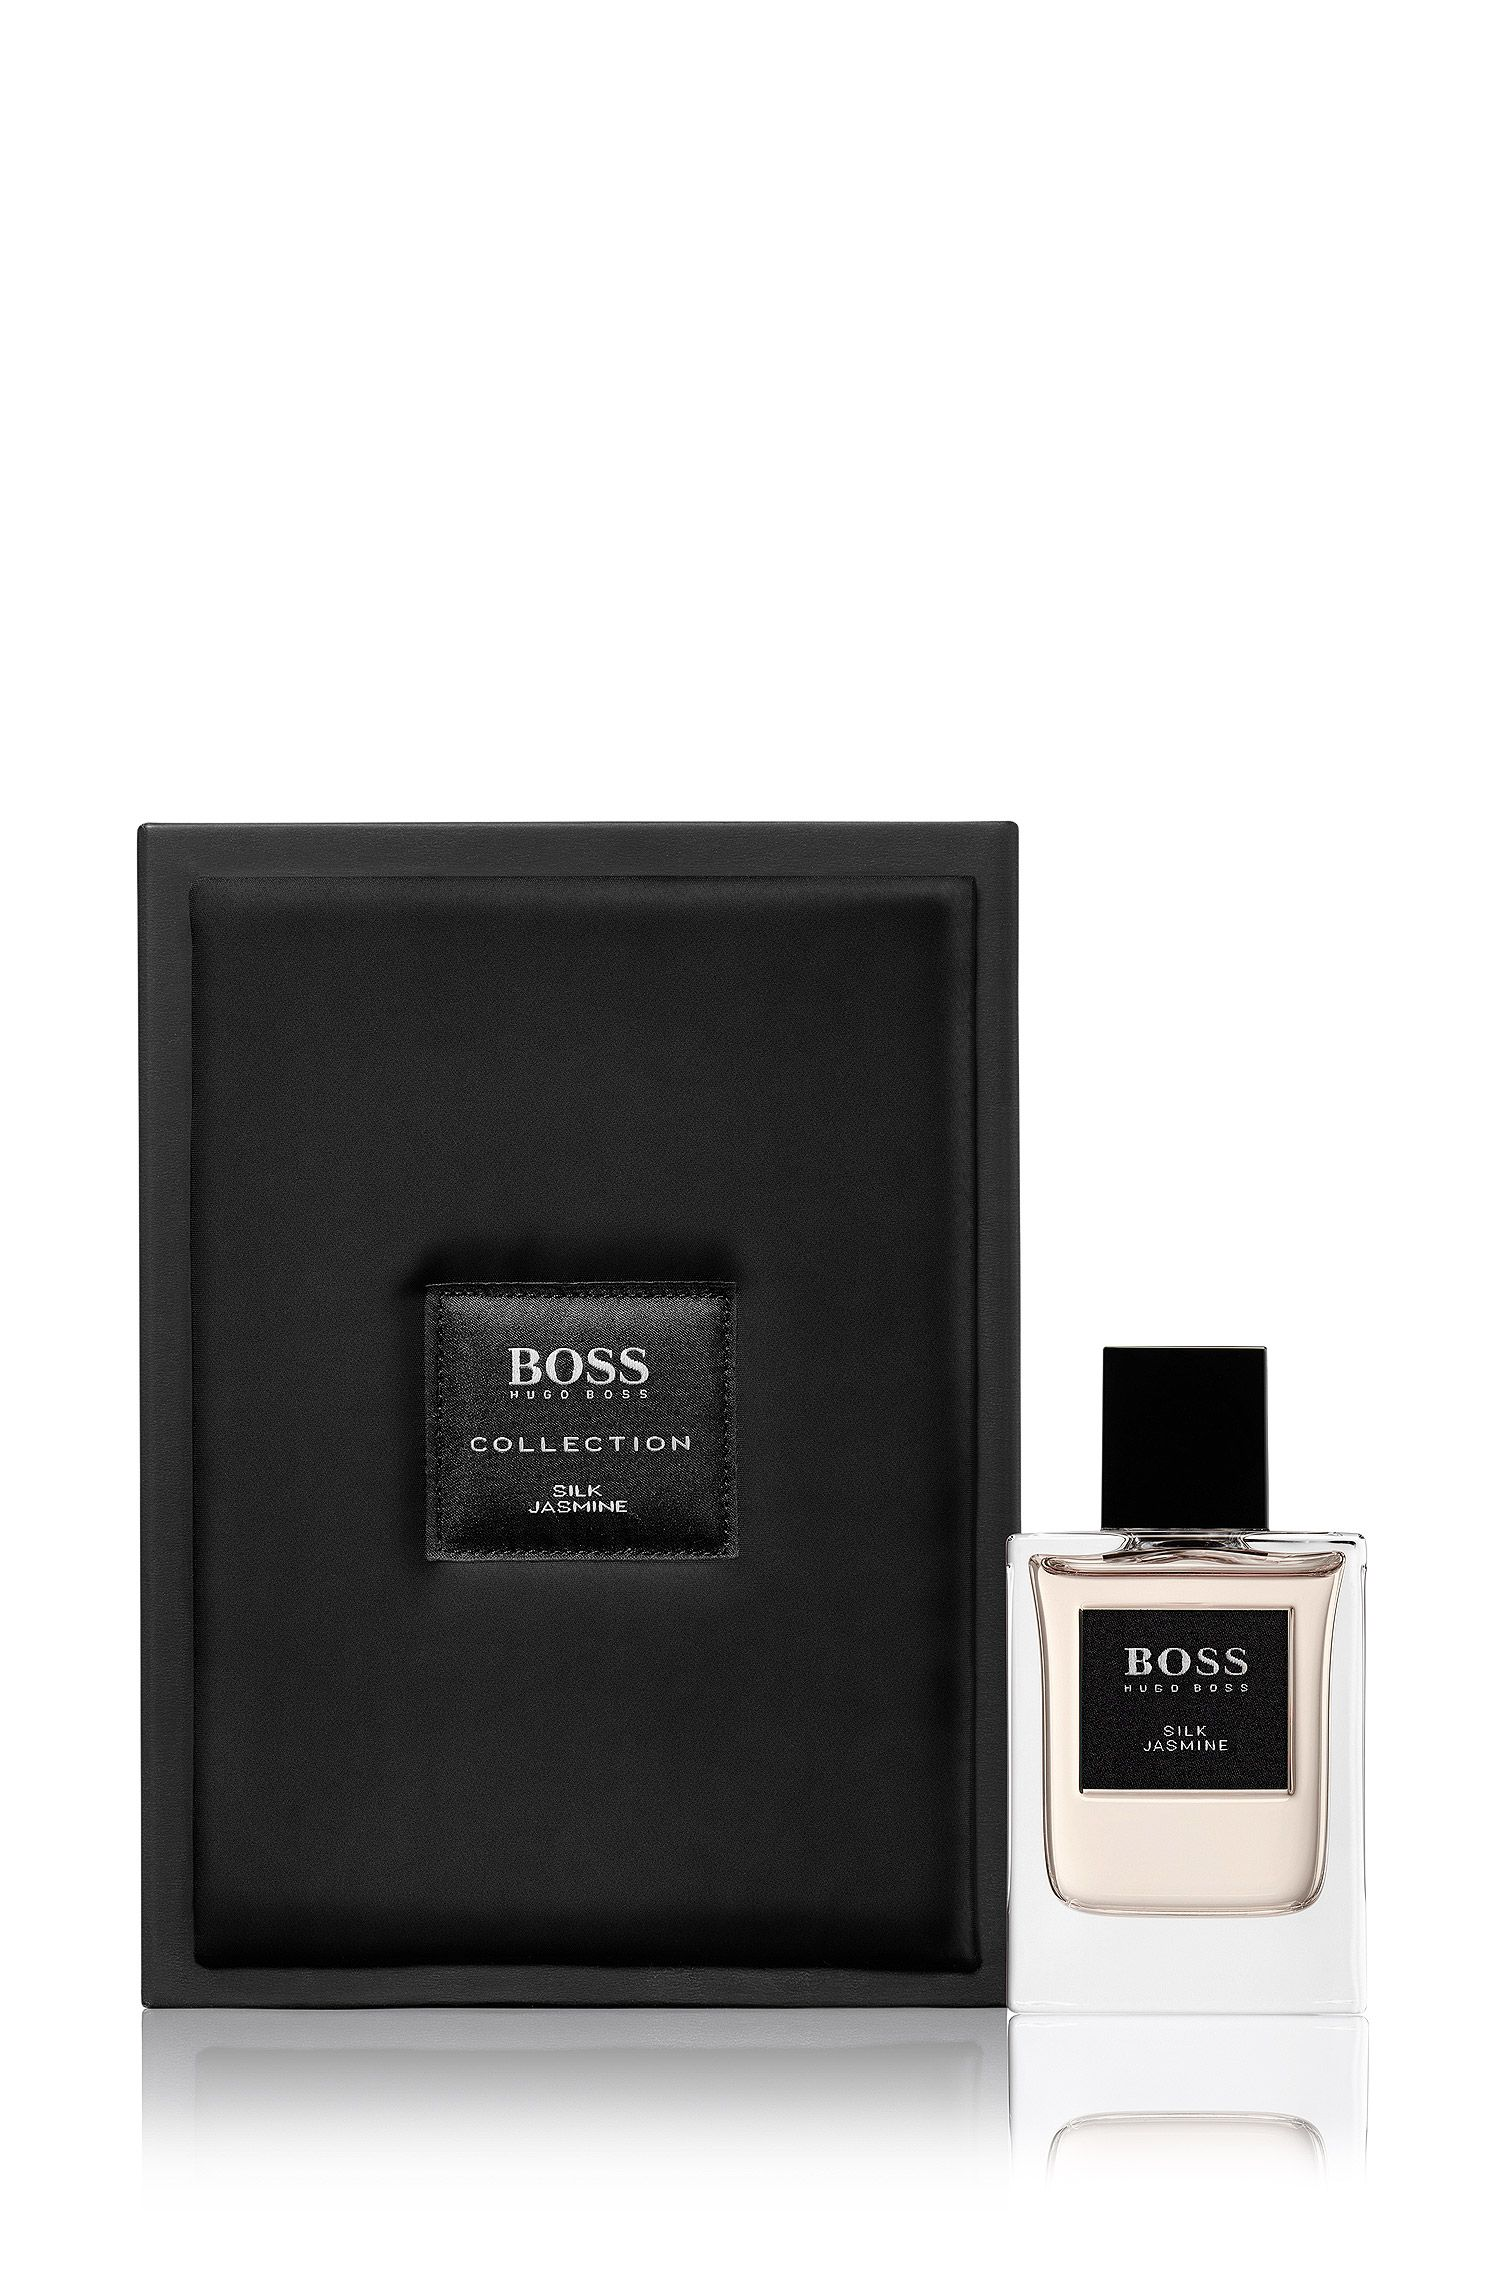 BOSS The Collection - Eau de Parfum Silk Jasmine